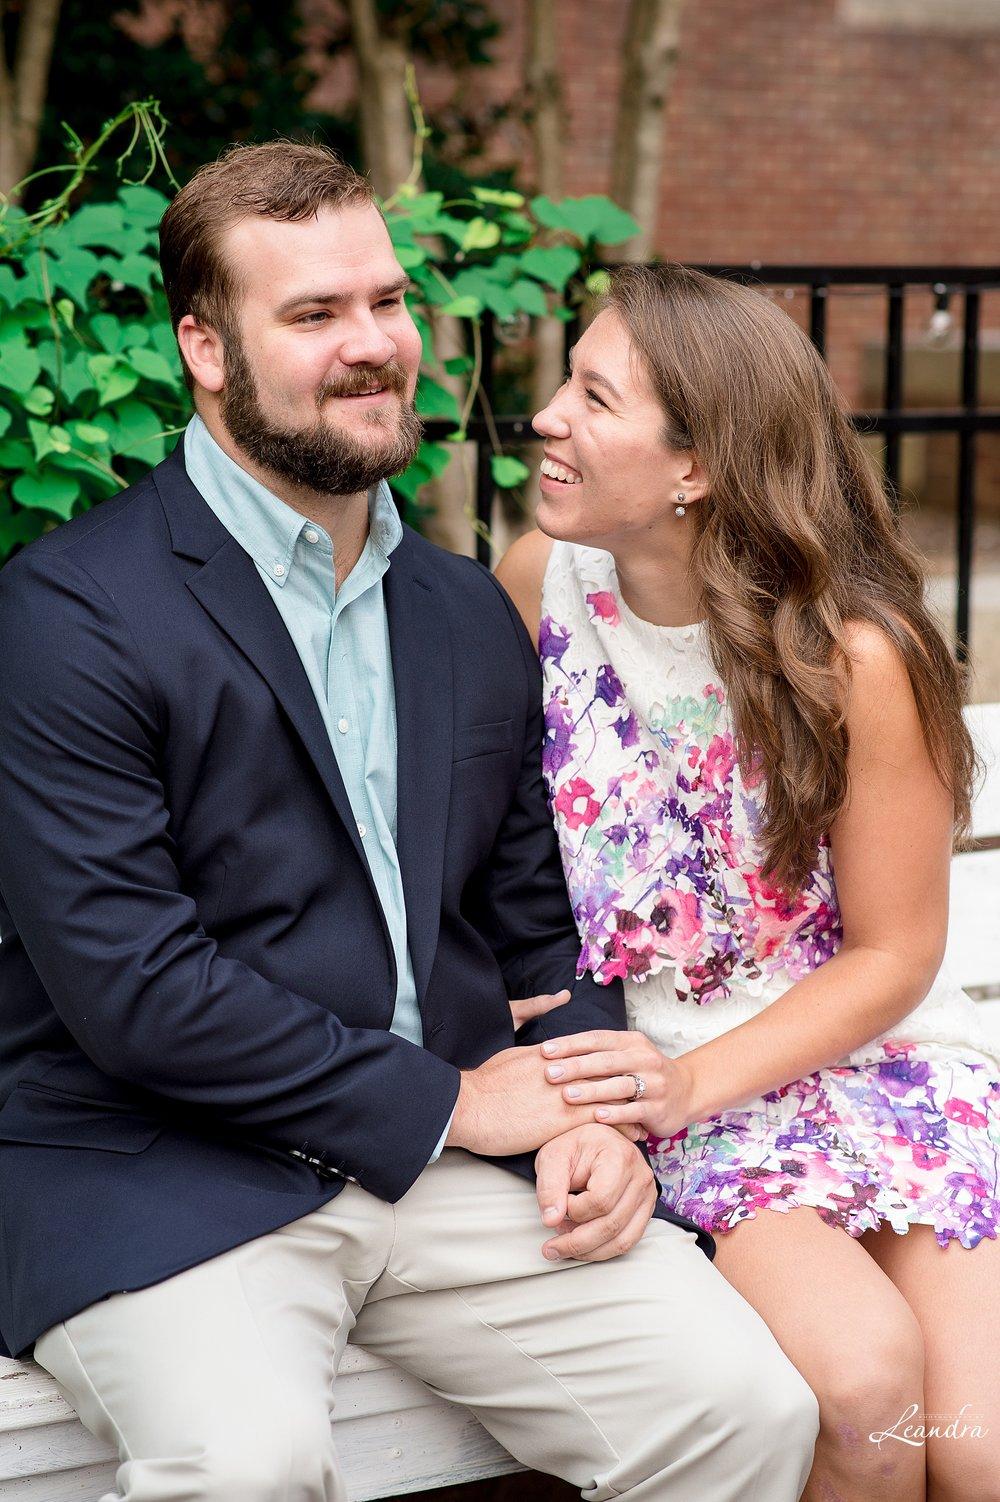 EmilyandJeff.Engaged-20.jpg